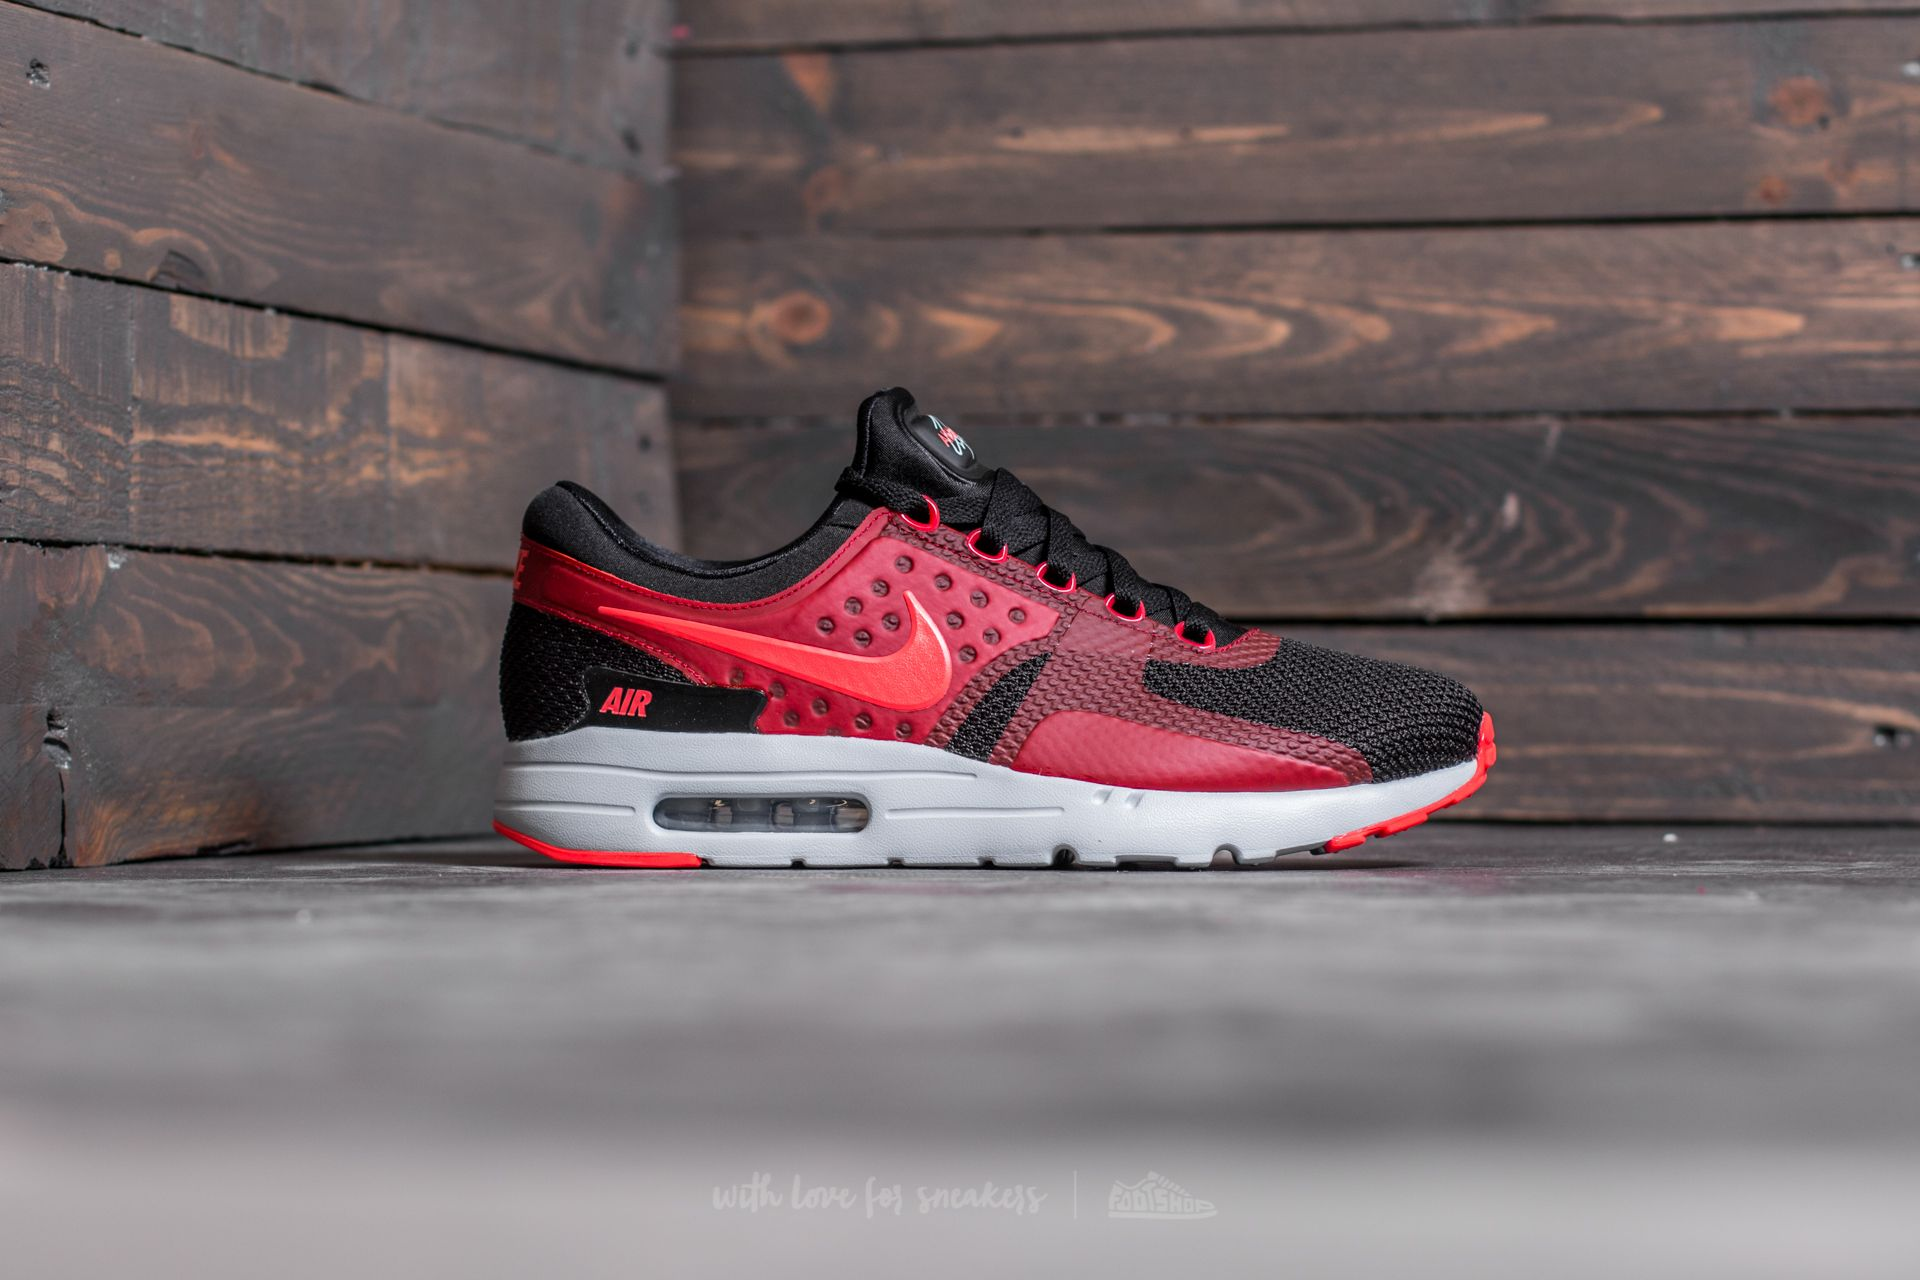 best service 99313 060cb Nike Air Max Zero Essential Black/ Bright Crimson-Gym Red ...